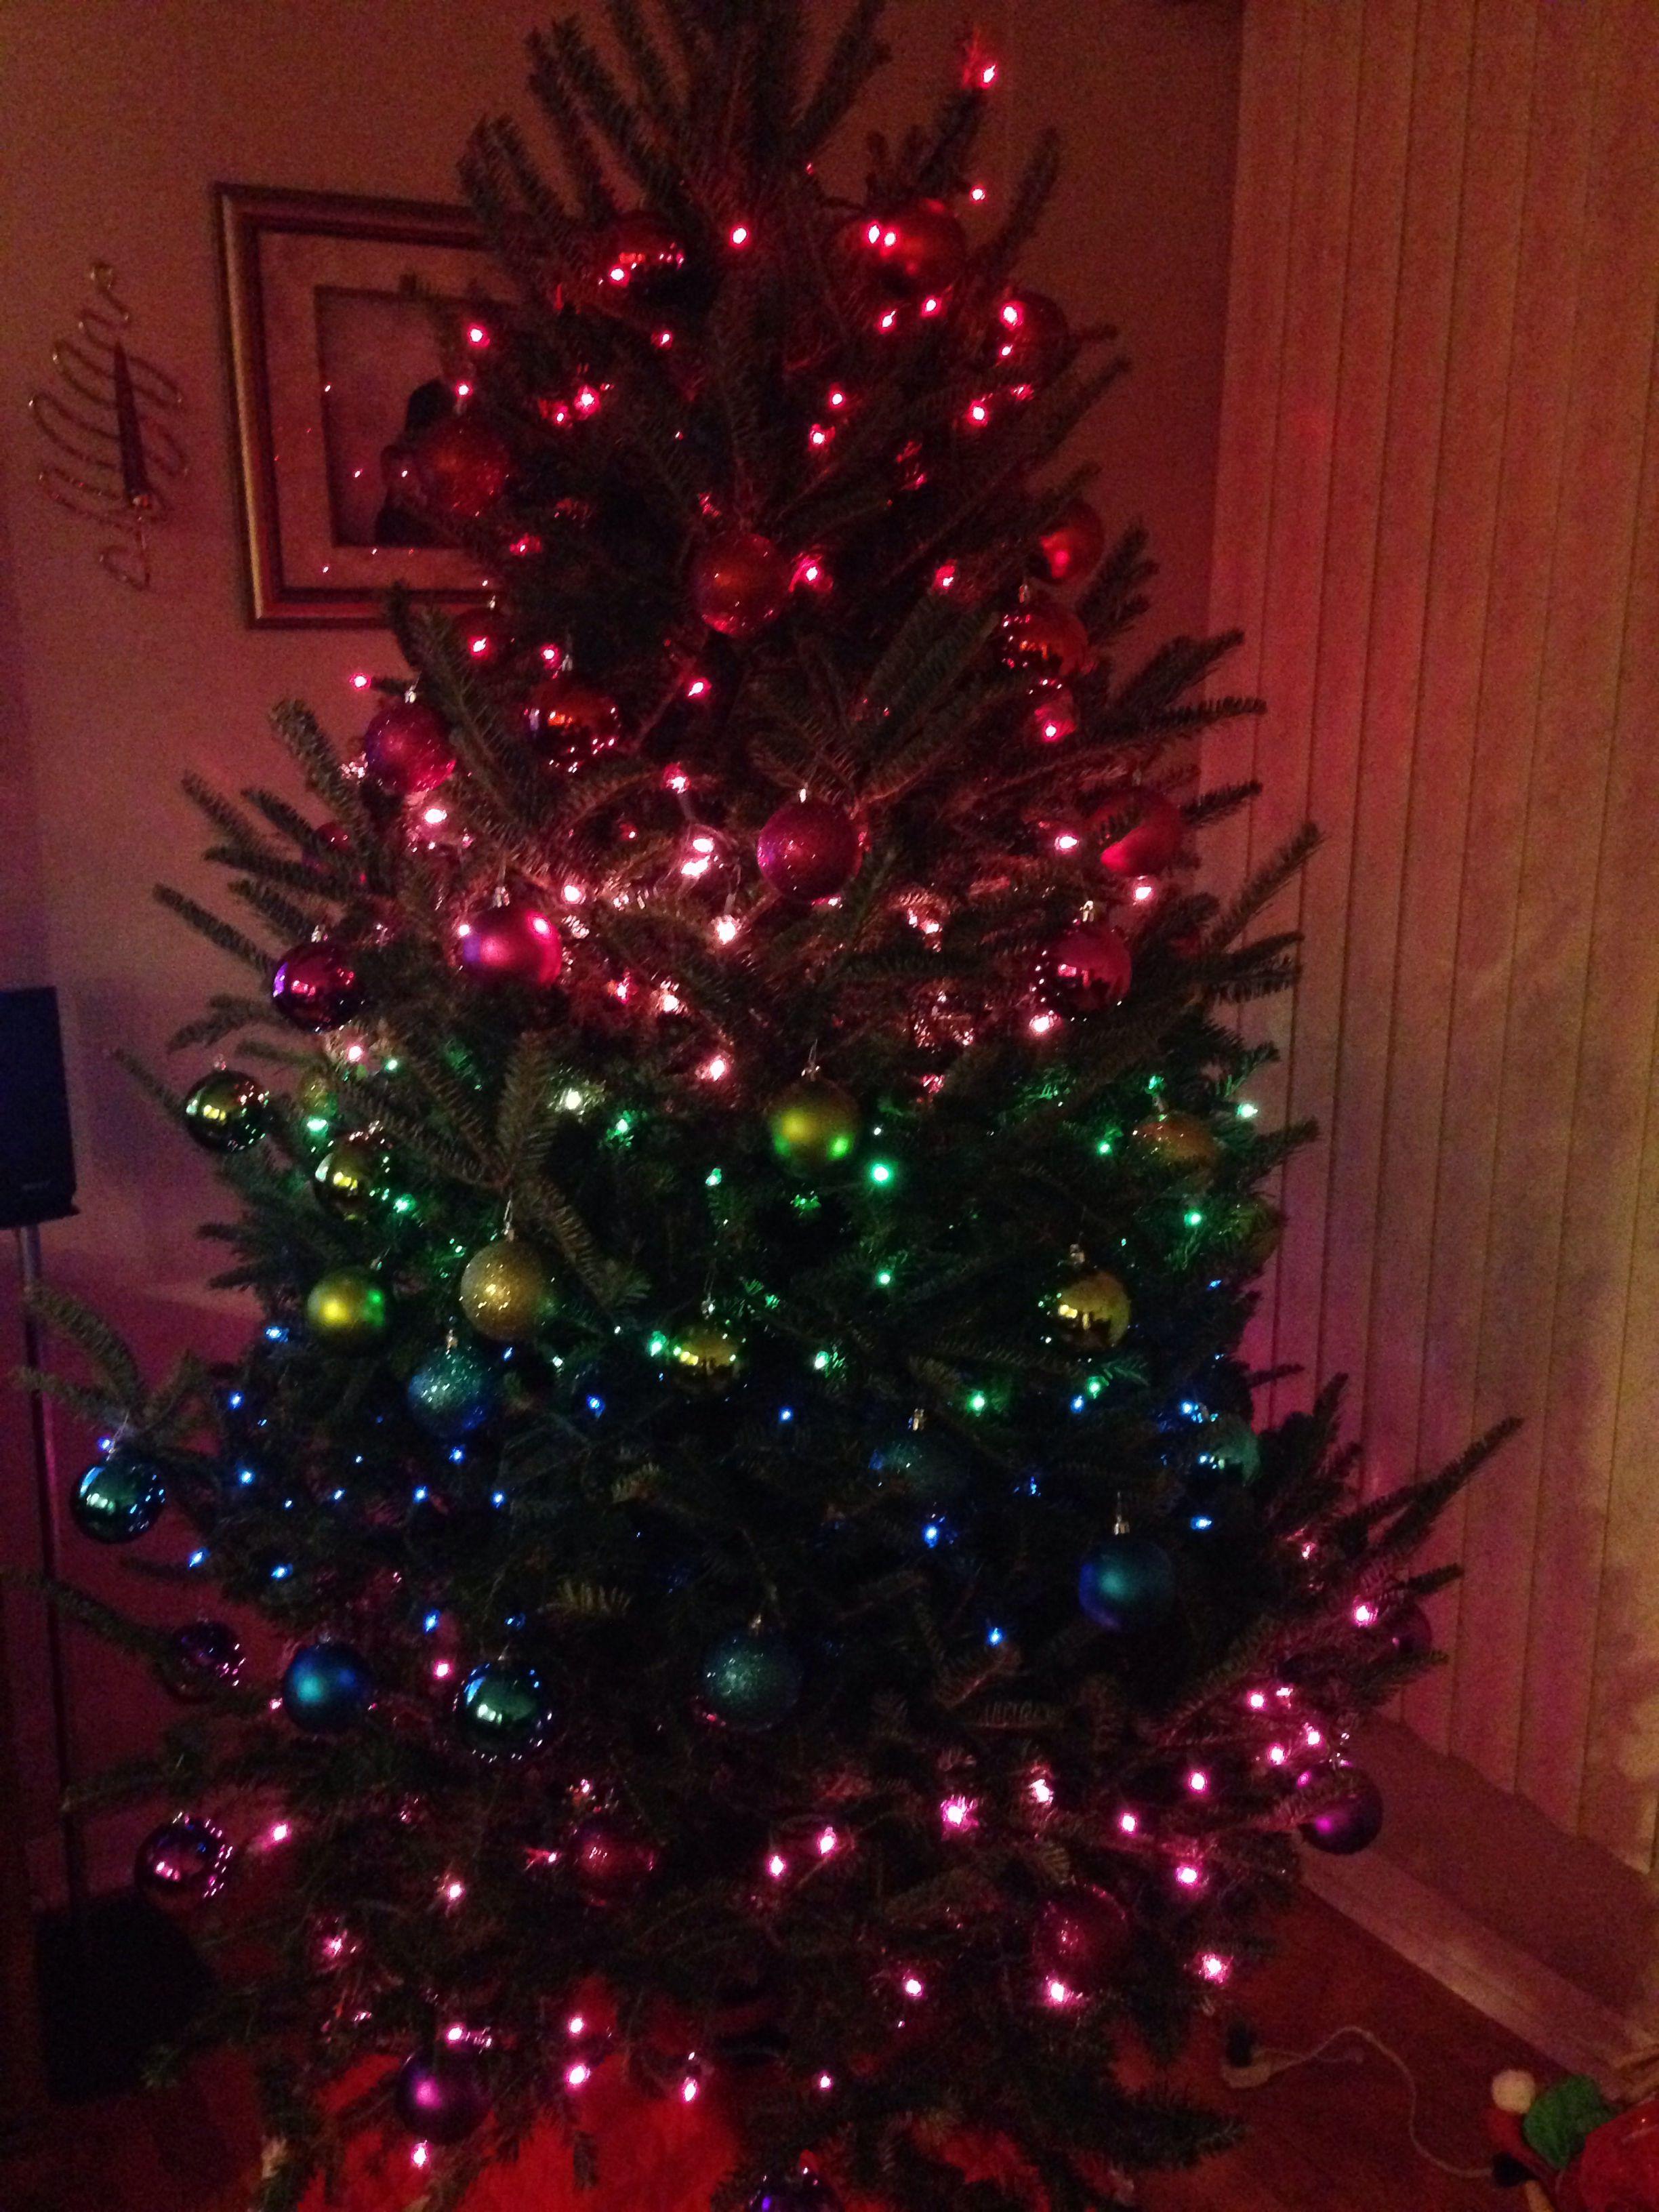 rainbow colored christmas tree using target ornaments and lights - Target Christmas Tree Lights